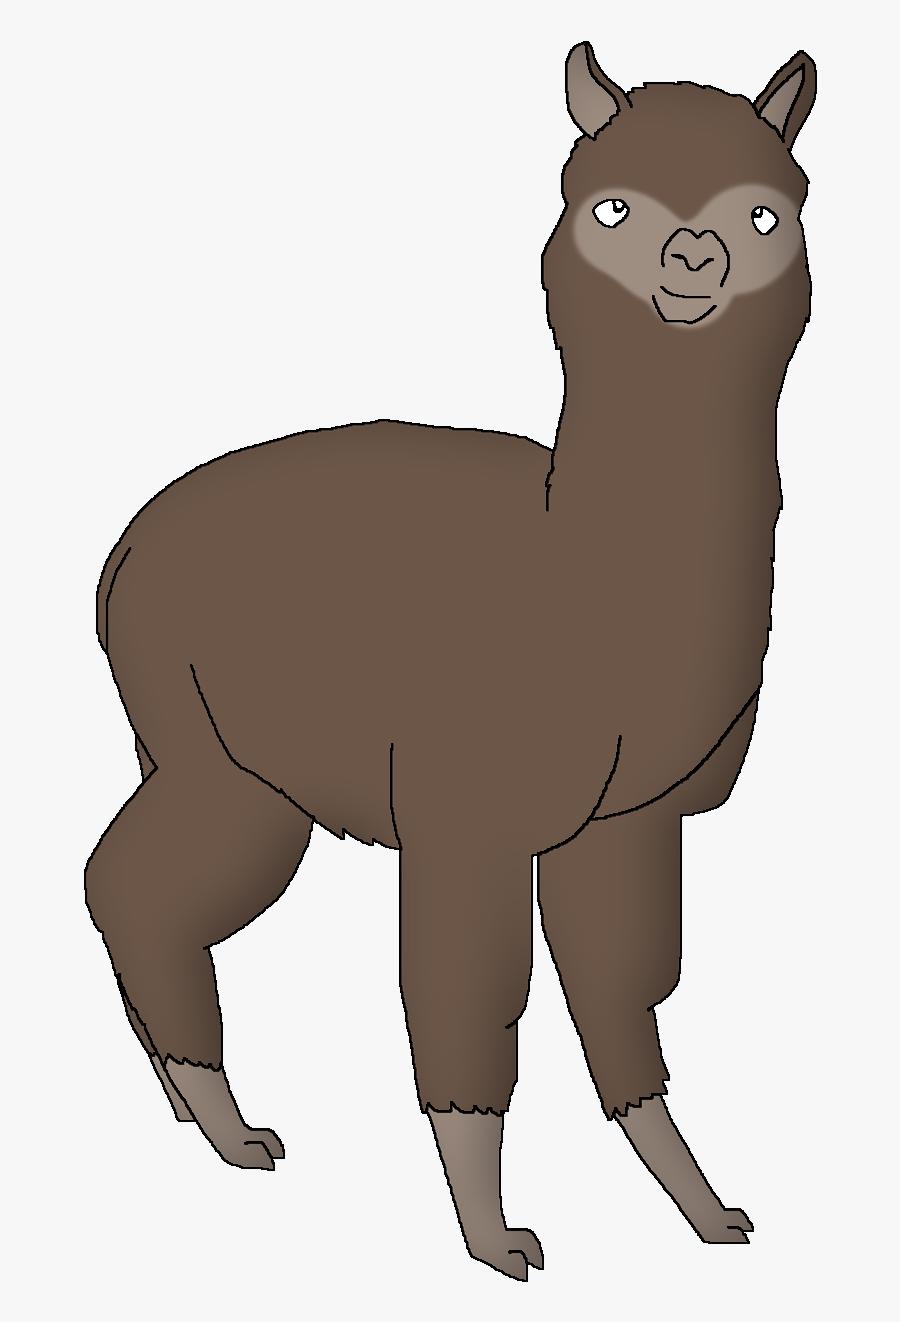 Wildlife Animal Pedia Wiki - Punxsutawney Phil, Transparent Clipart